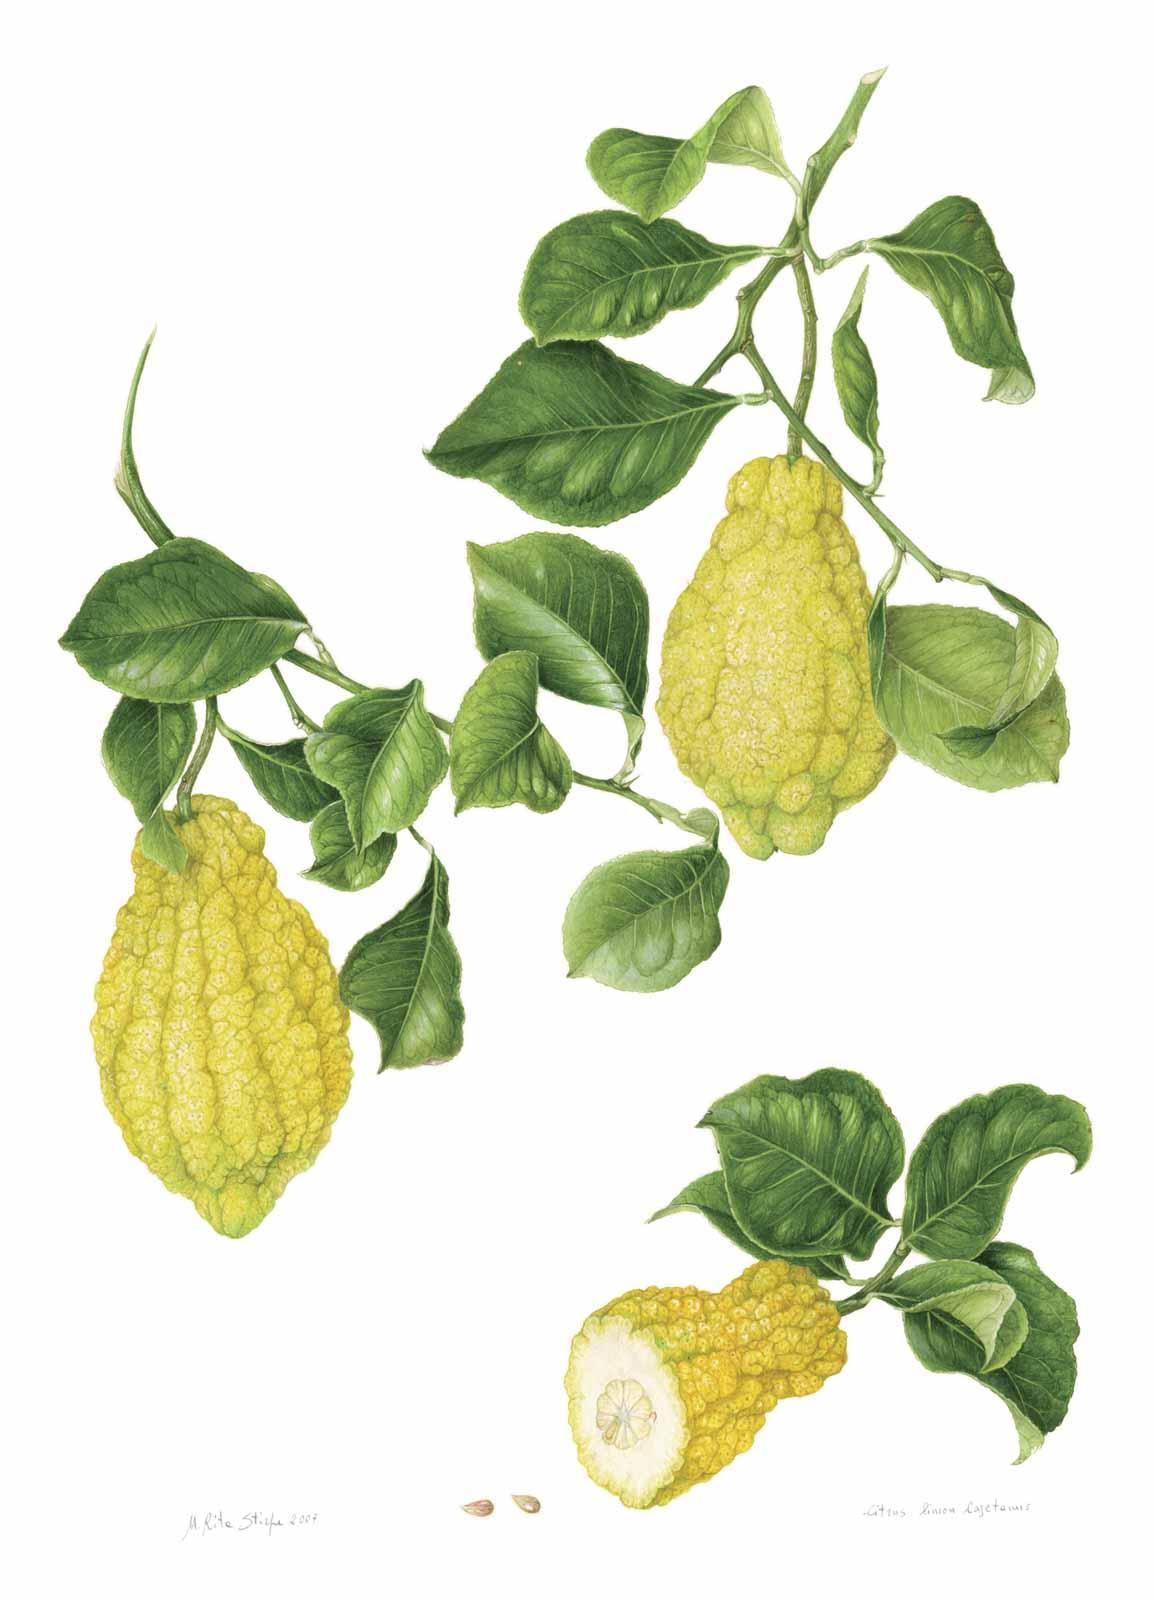 Catalogo - Ars Botanica - Stampa 16